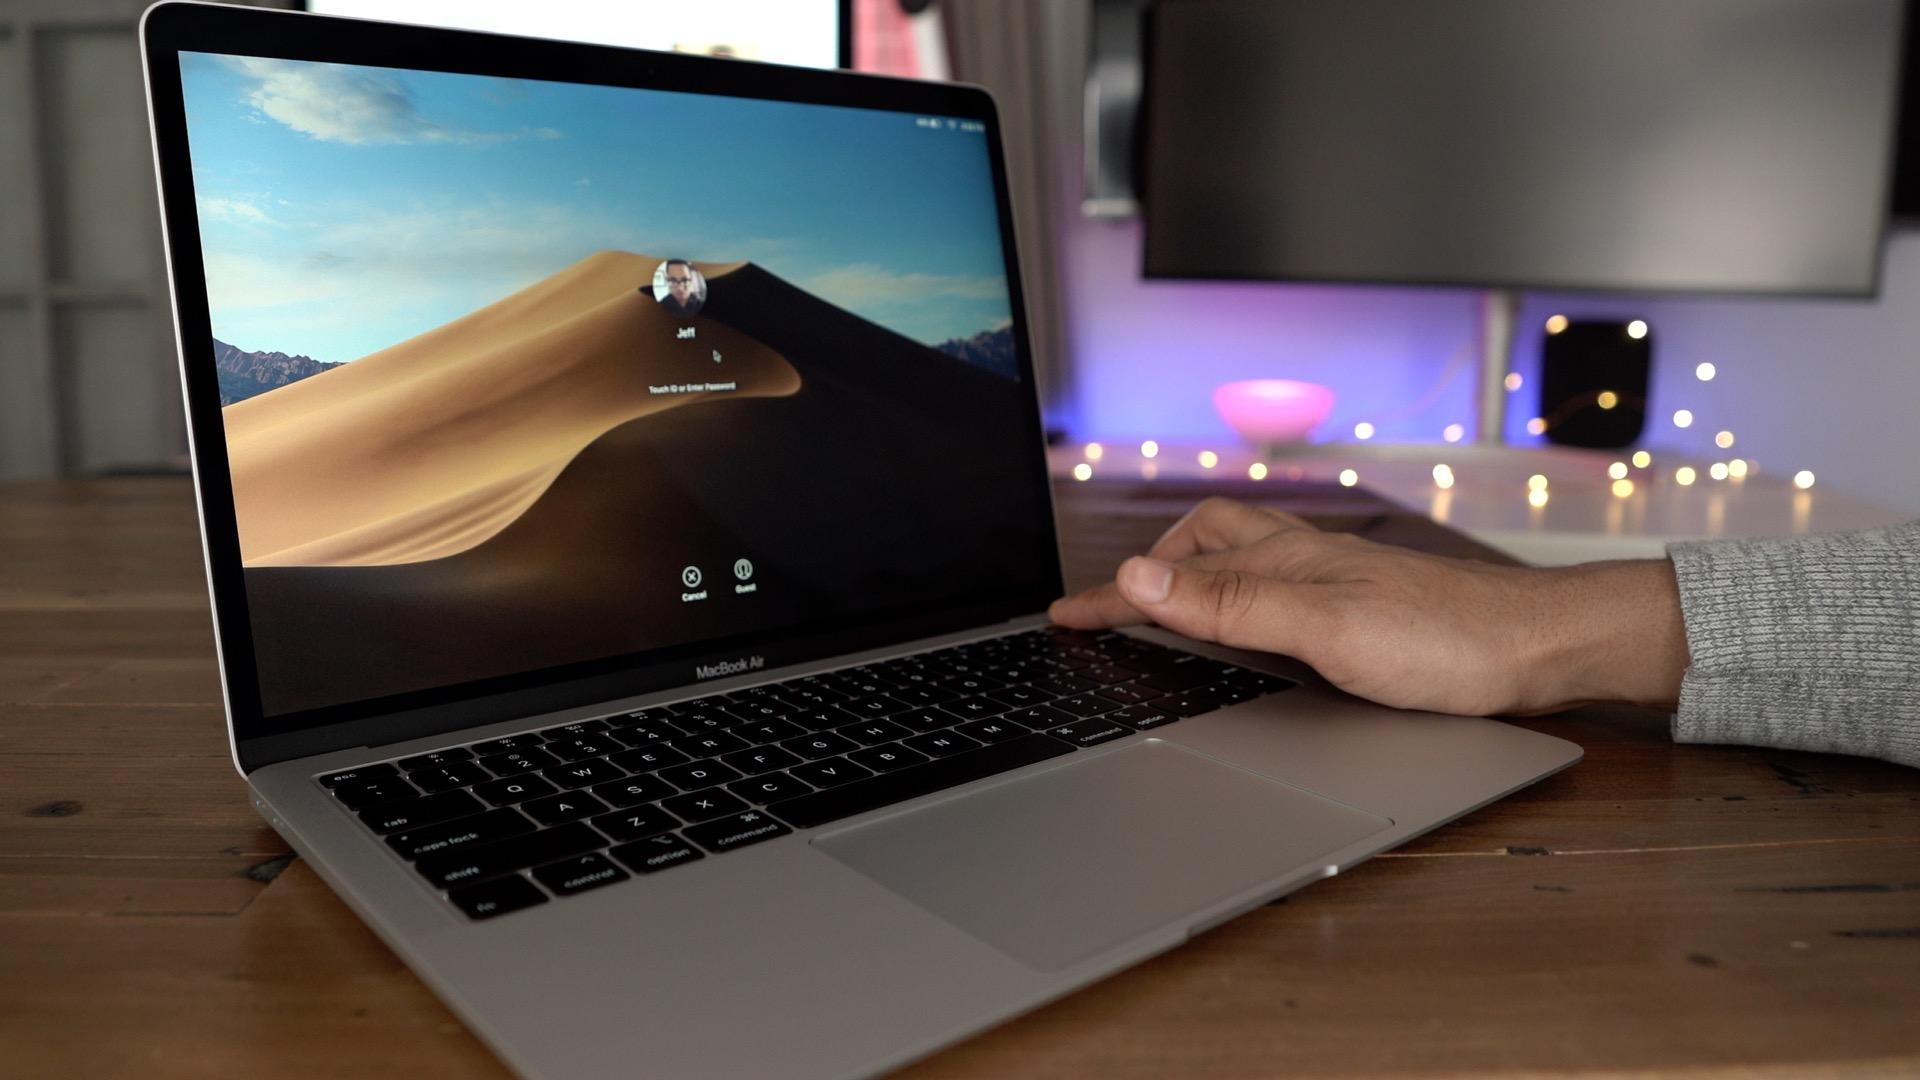 Apple Releases 2019 Retina Macbook Air With True Tone